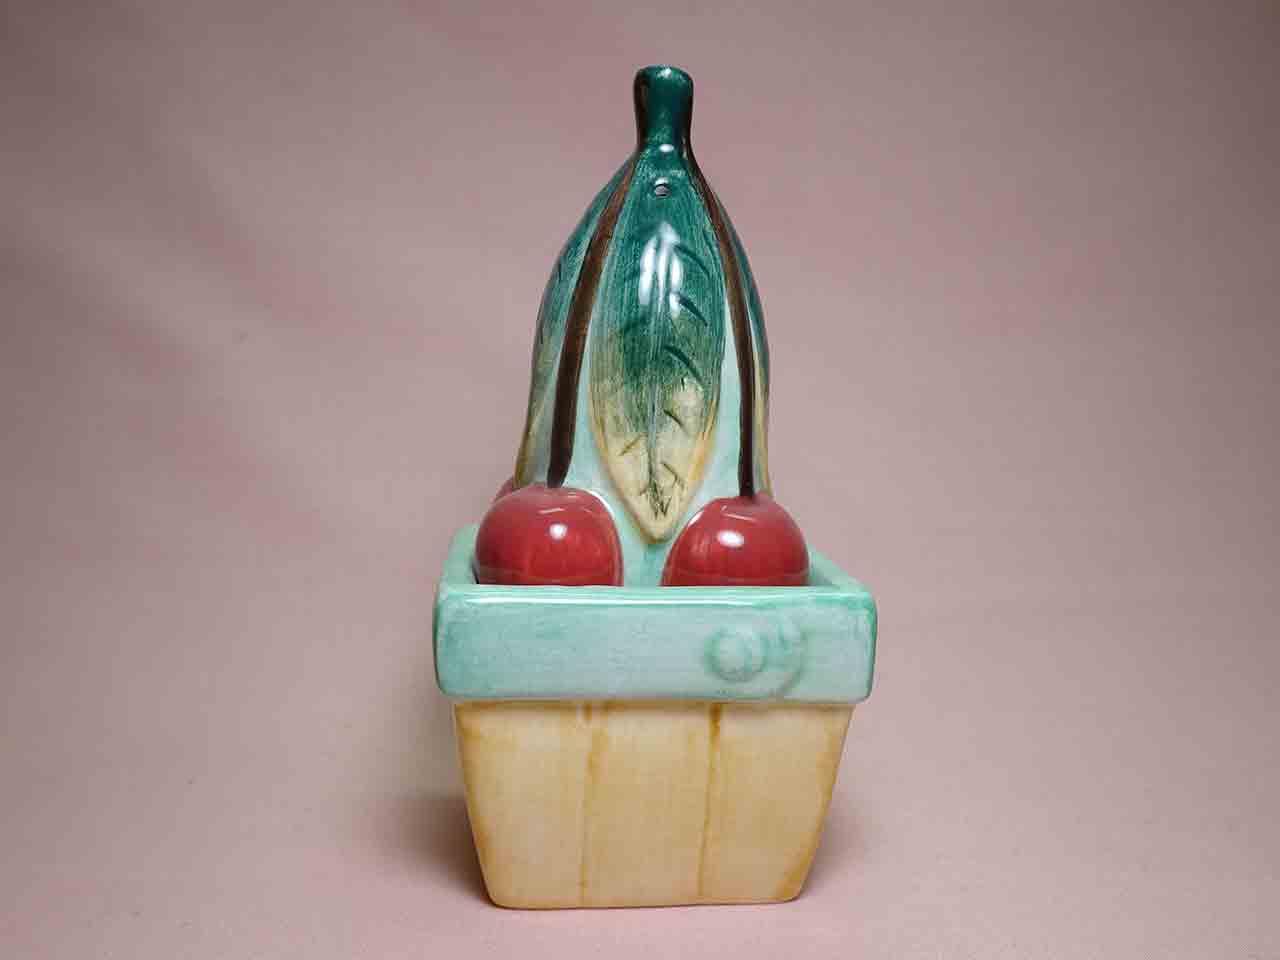 Vandor household items salt and pepper shakers - plant in flower pot